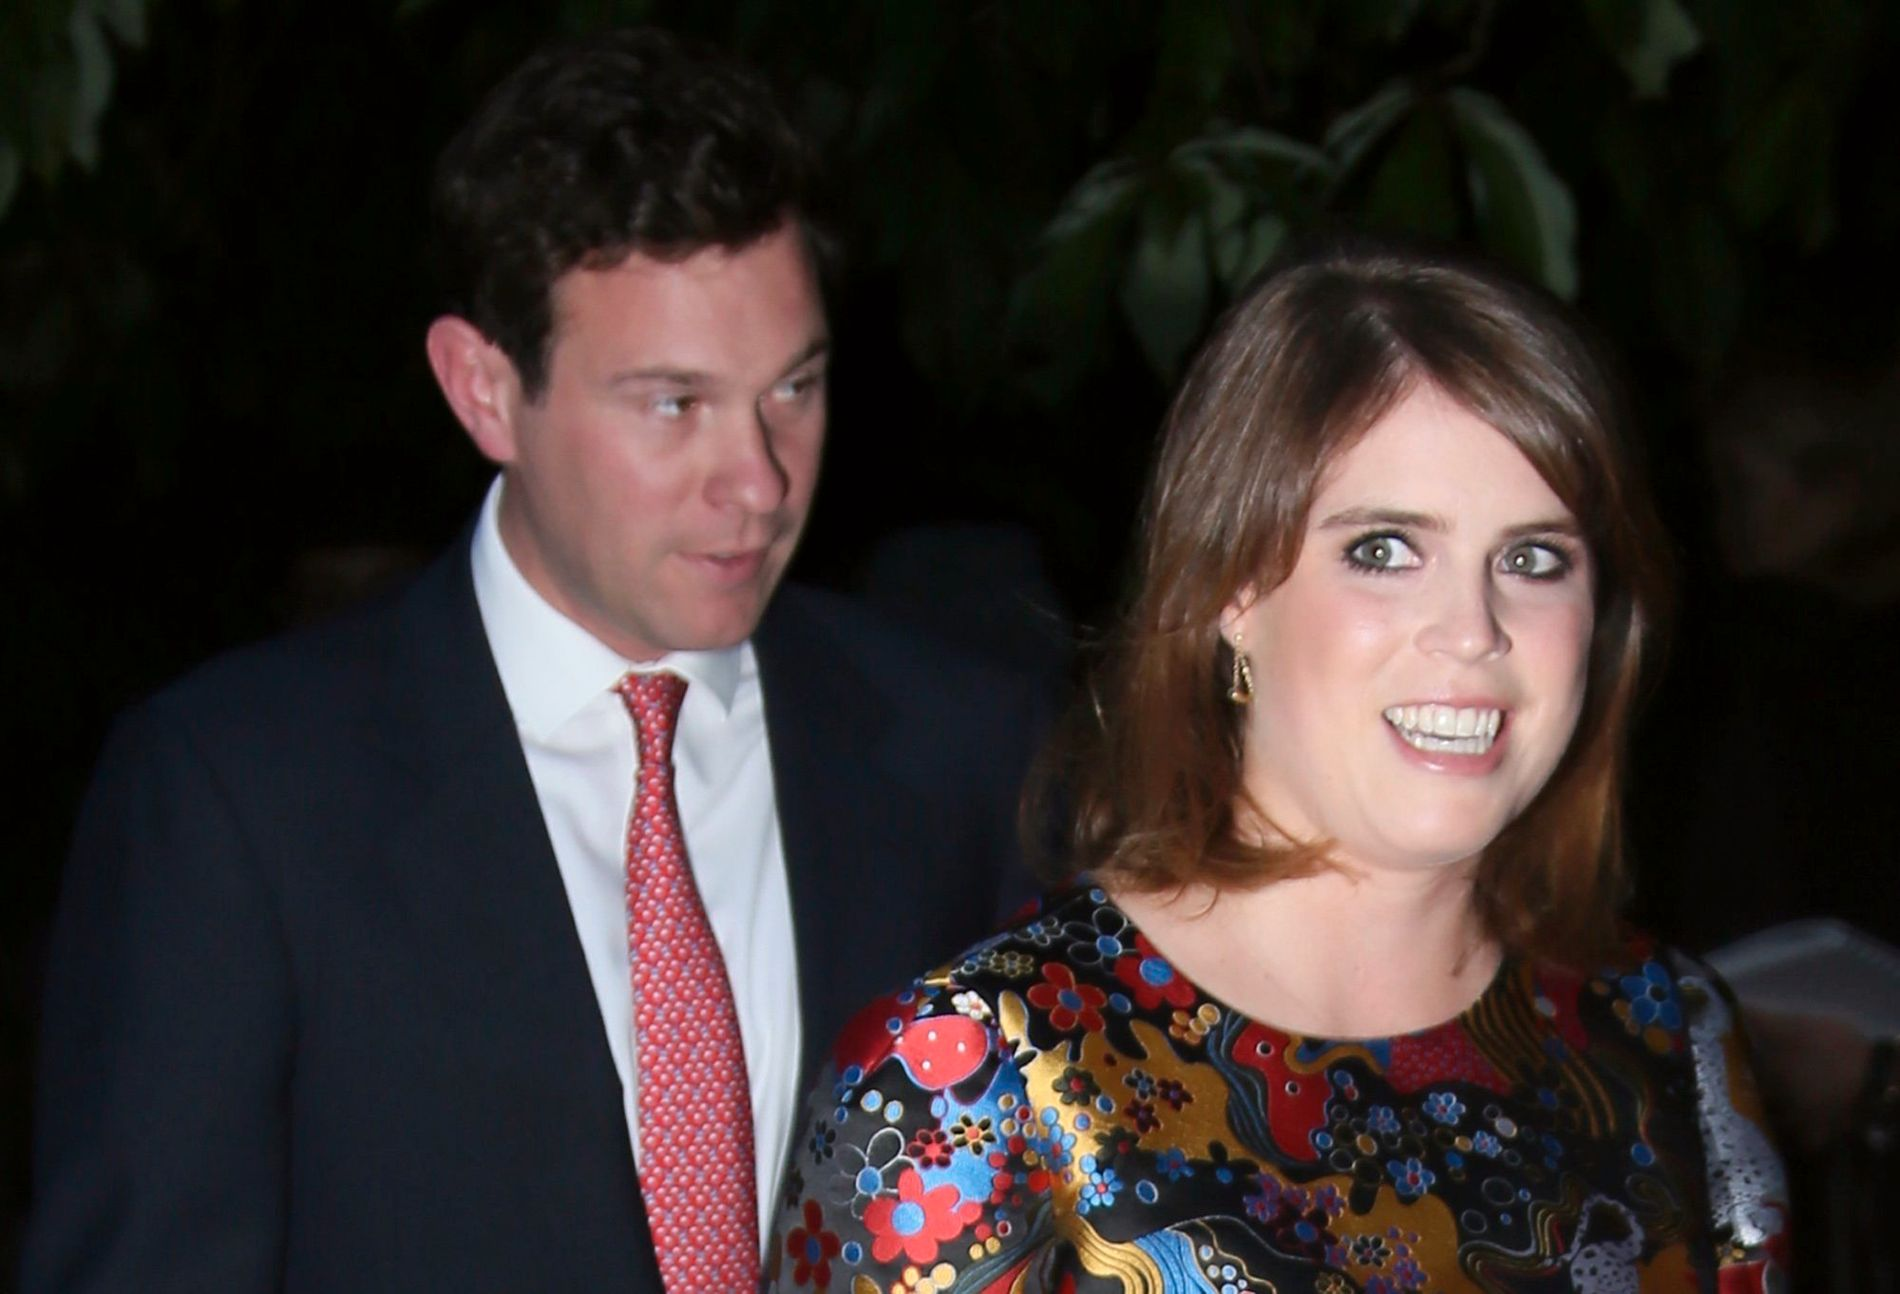 GIFTEKLARE: Prinsesse Eugenie og Jack Brooksbank på en kjendisfest i London i fjor sommer.